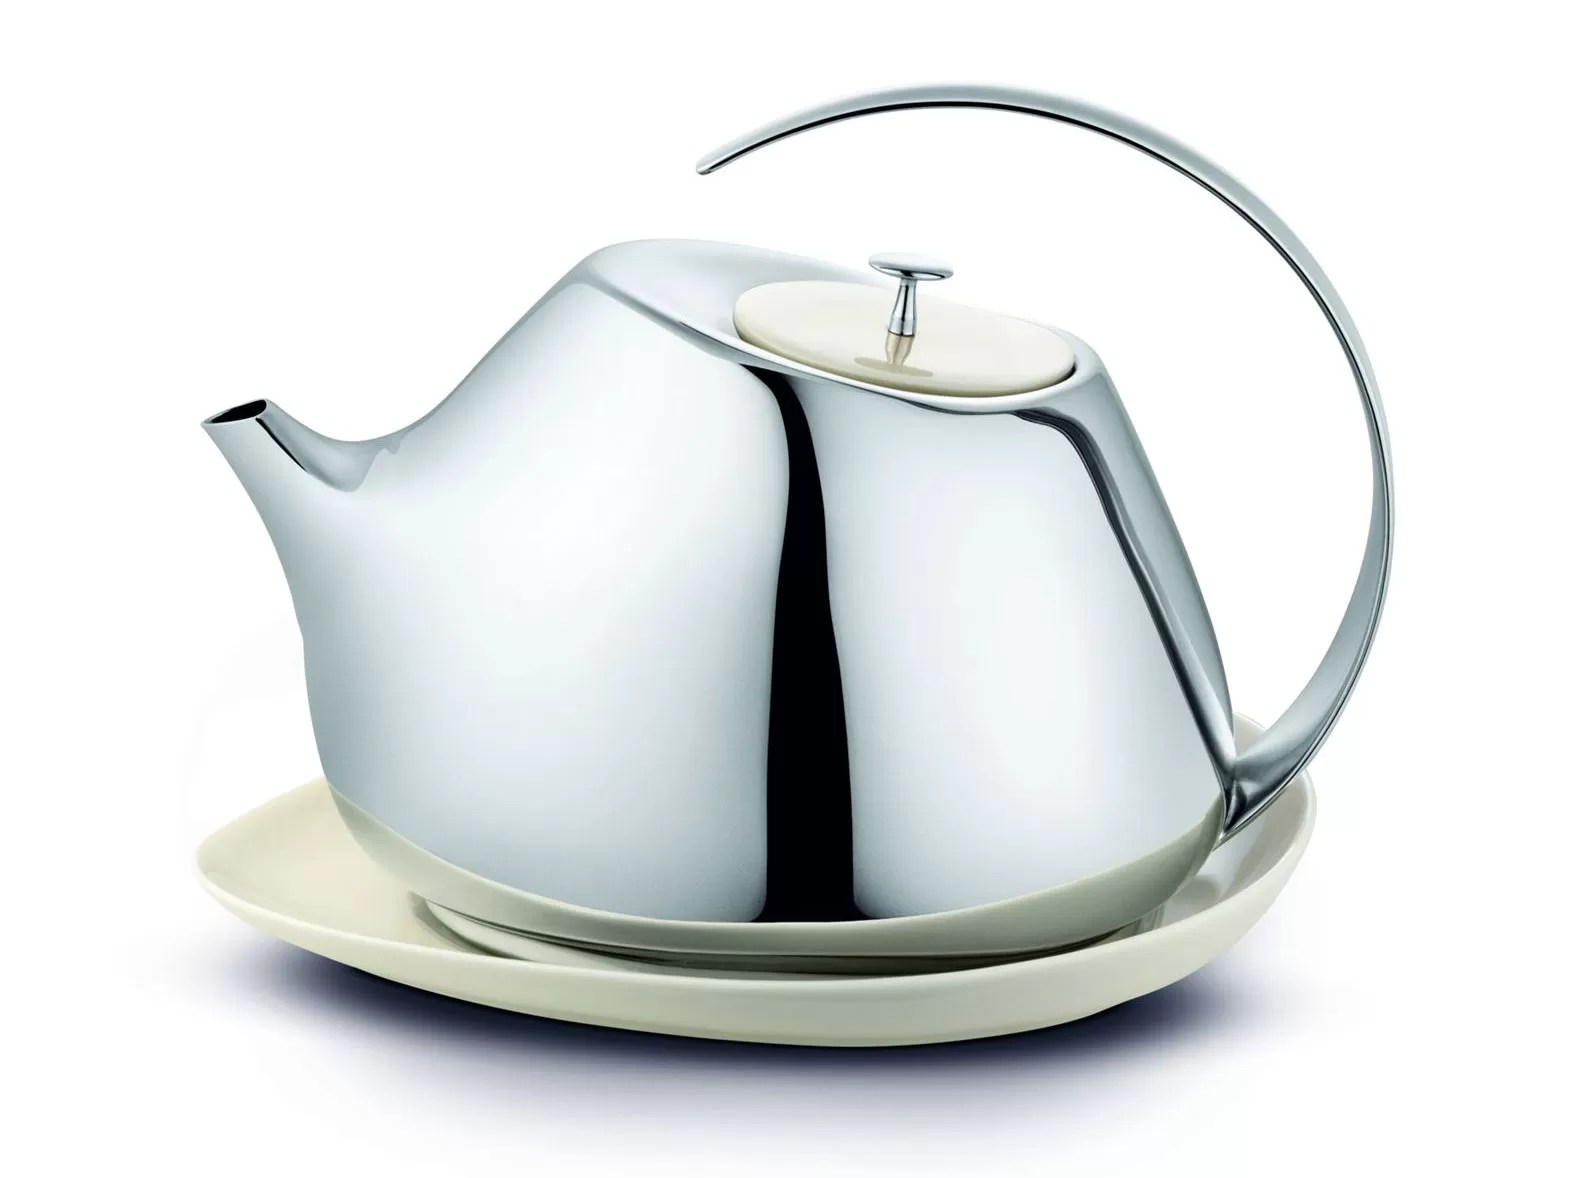 regali di natale per amanti del tè - teiera di design